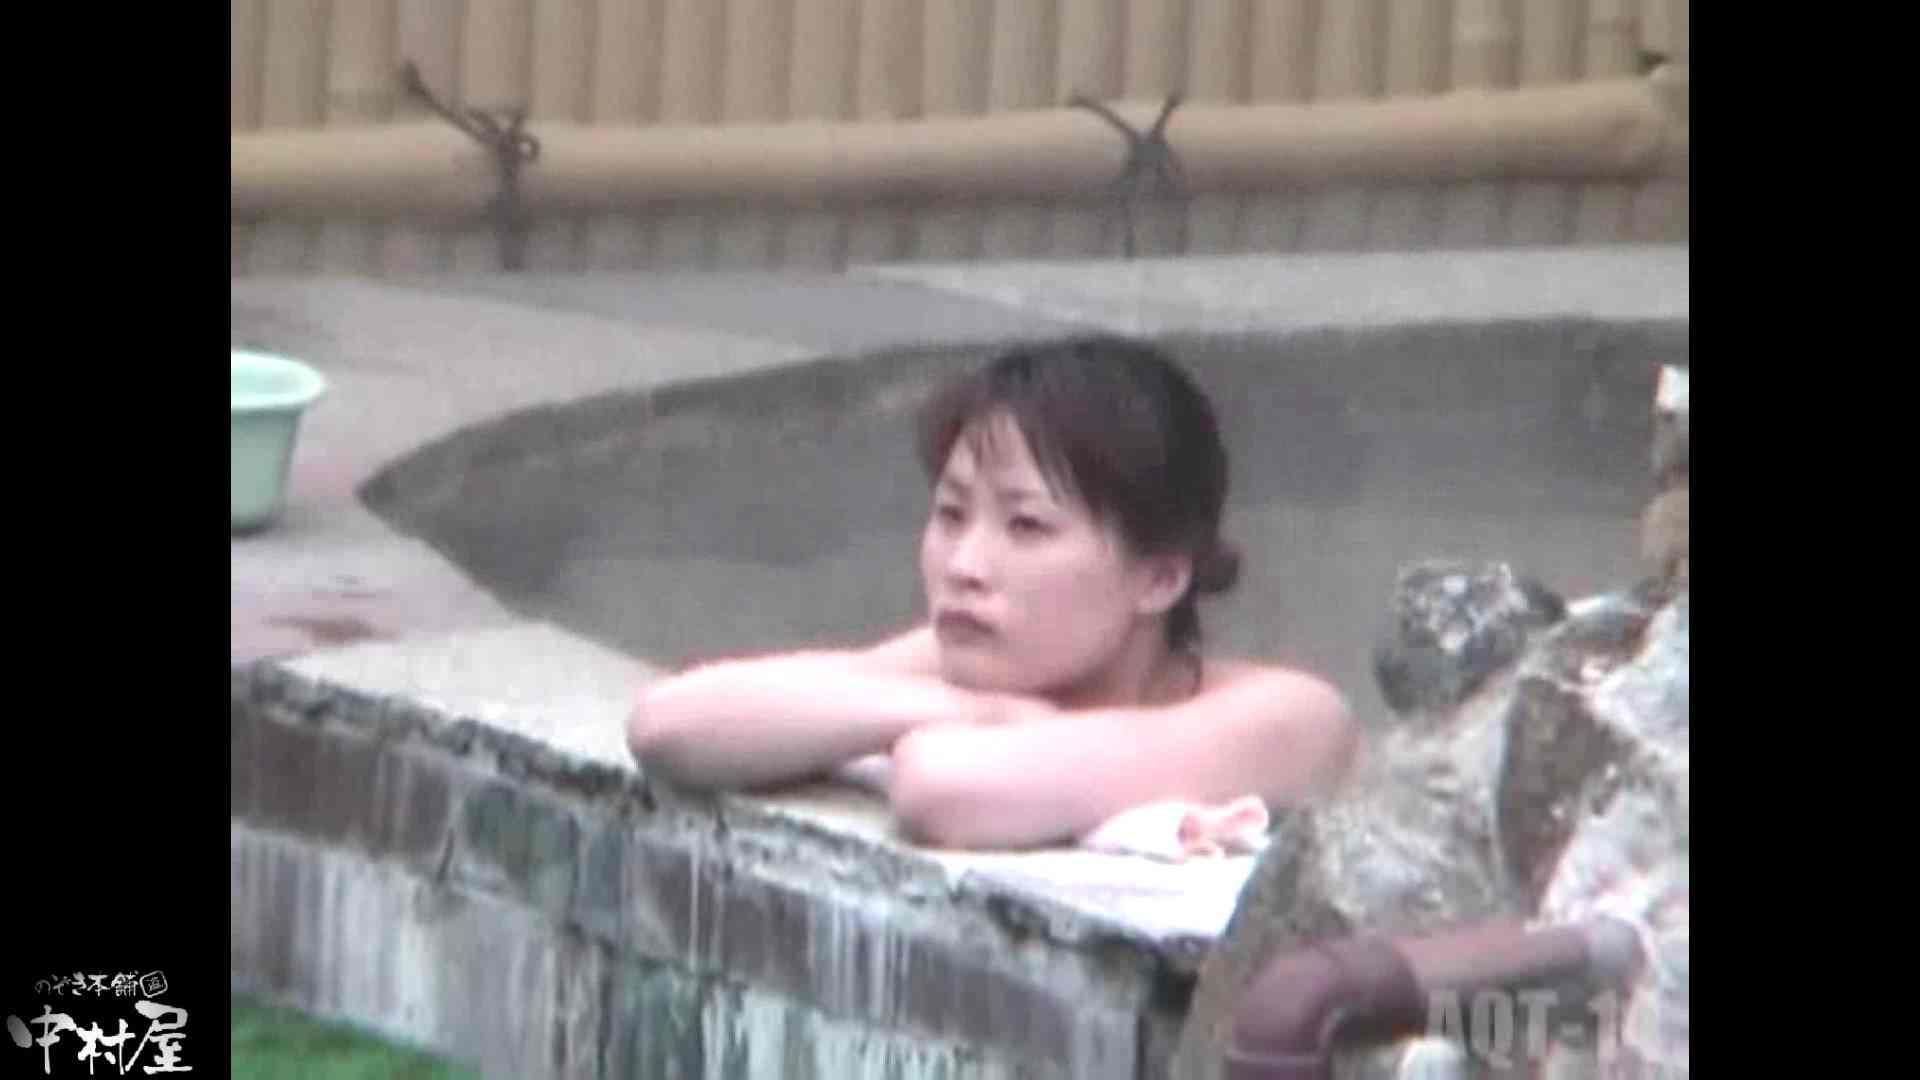 Aquaな露天風呂Vol.878潜入盗撮露天風呂十四判湯 其の三 潜入  48連発 19